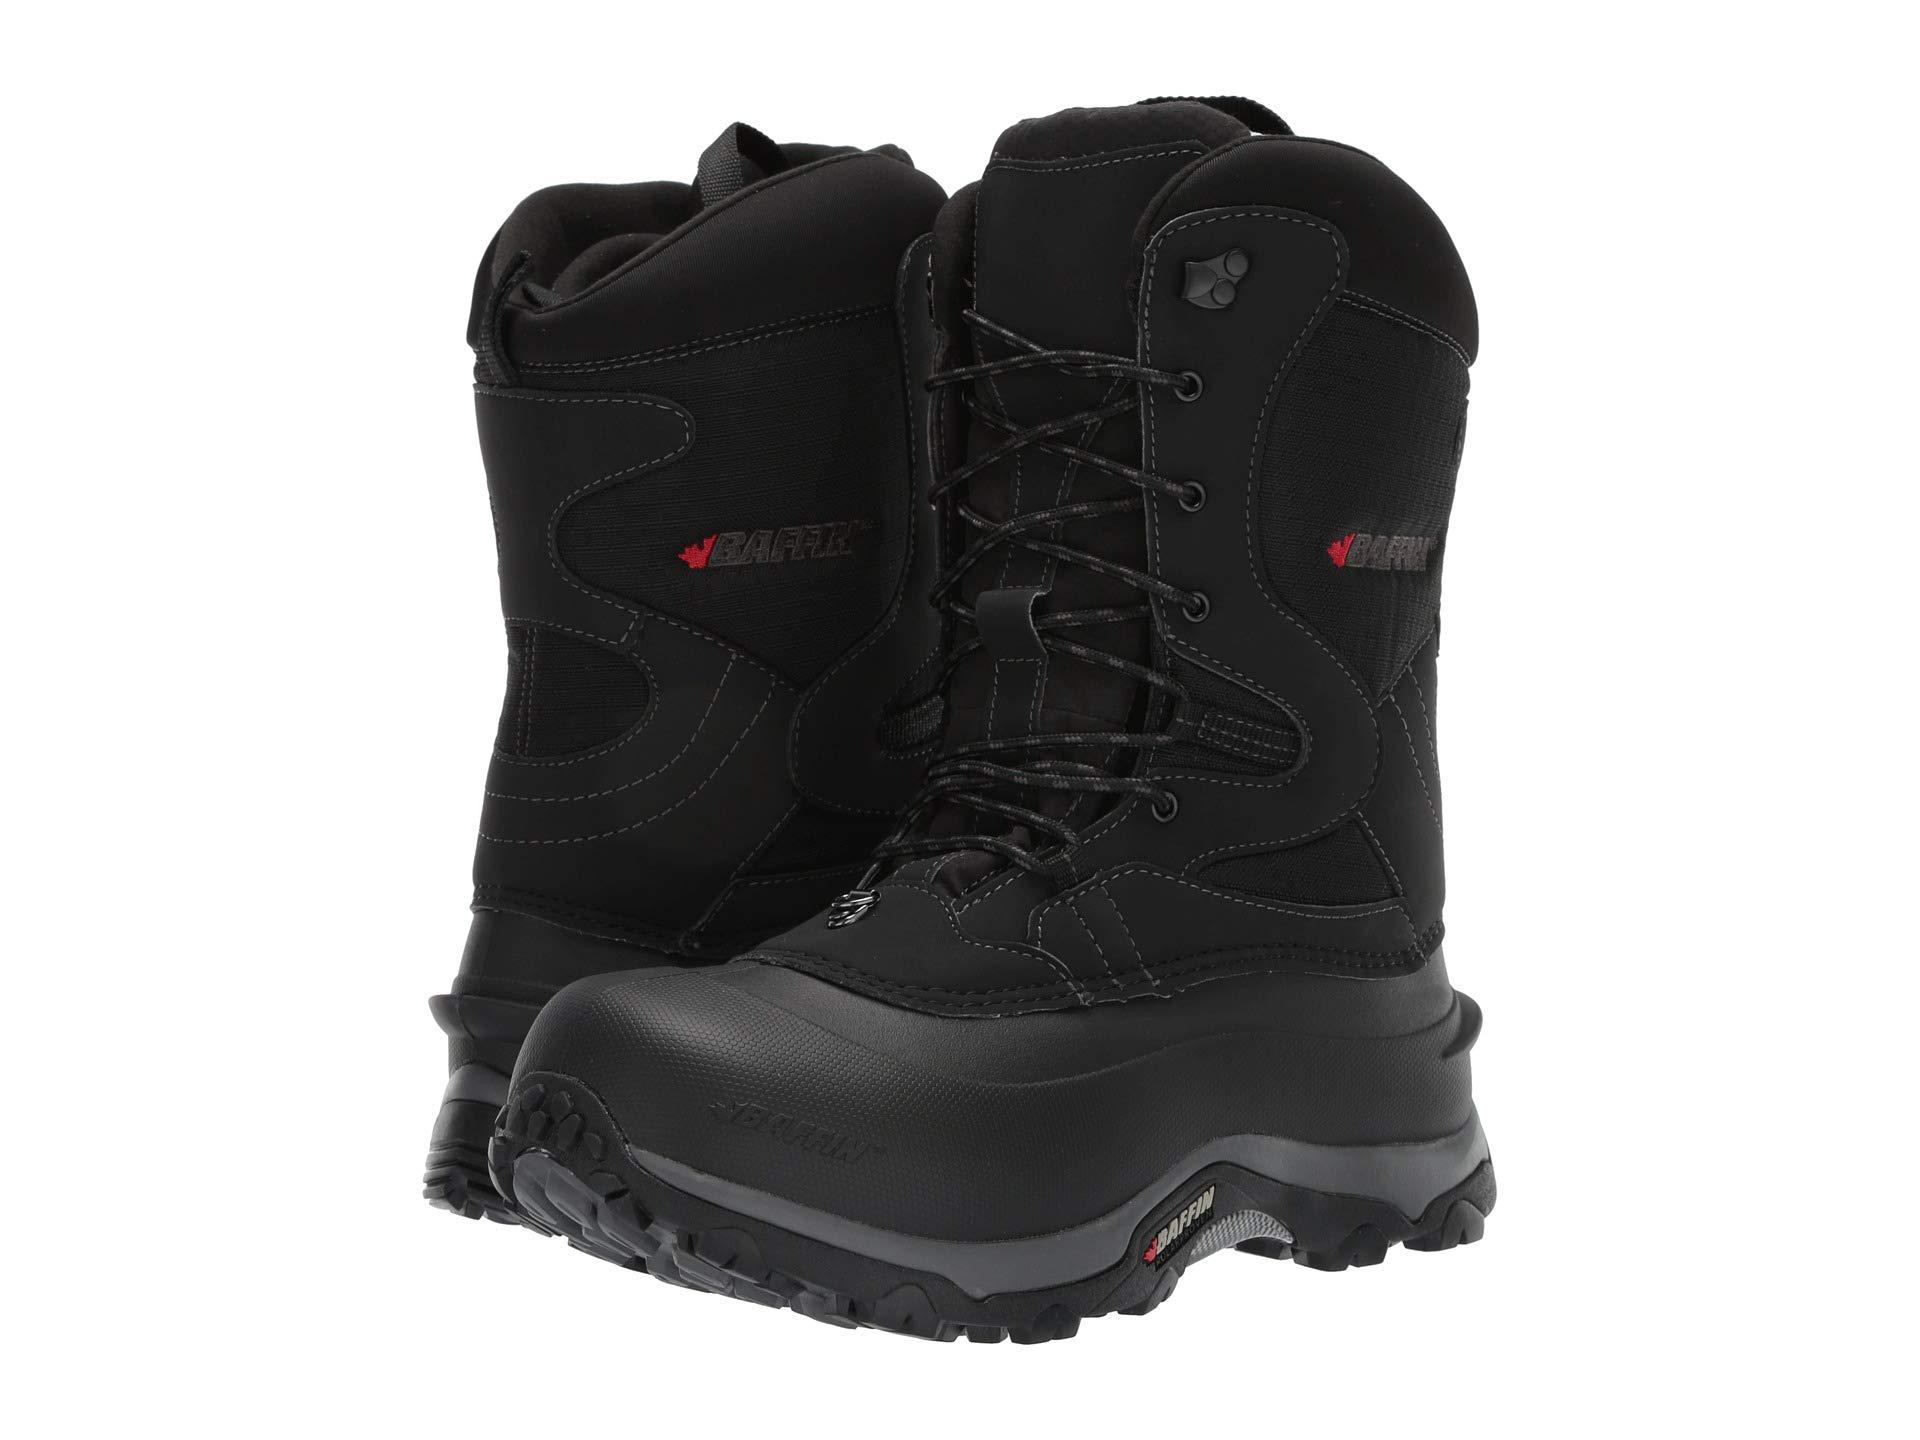 6d75105310ae Lyst - Baffin Summit (black) Men s Shoes in Black for Men